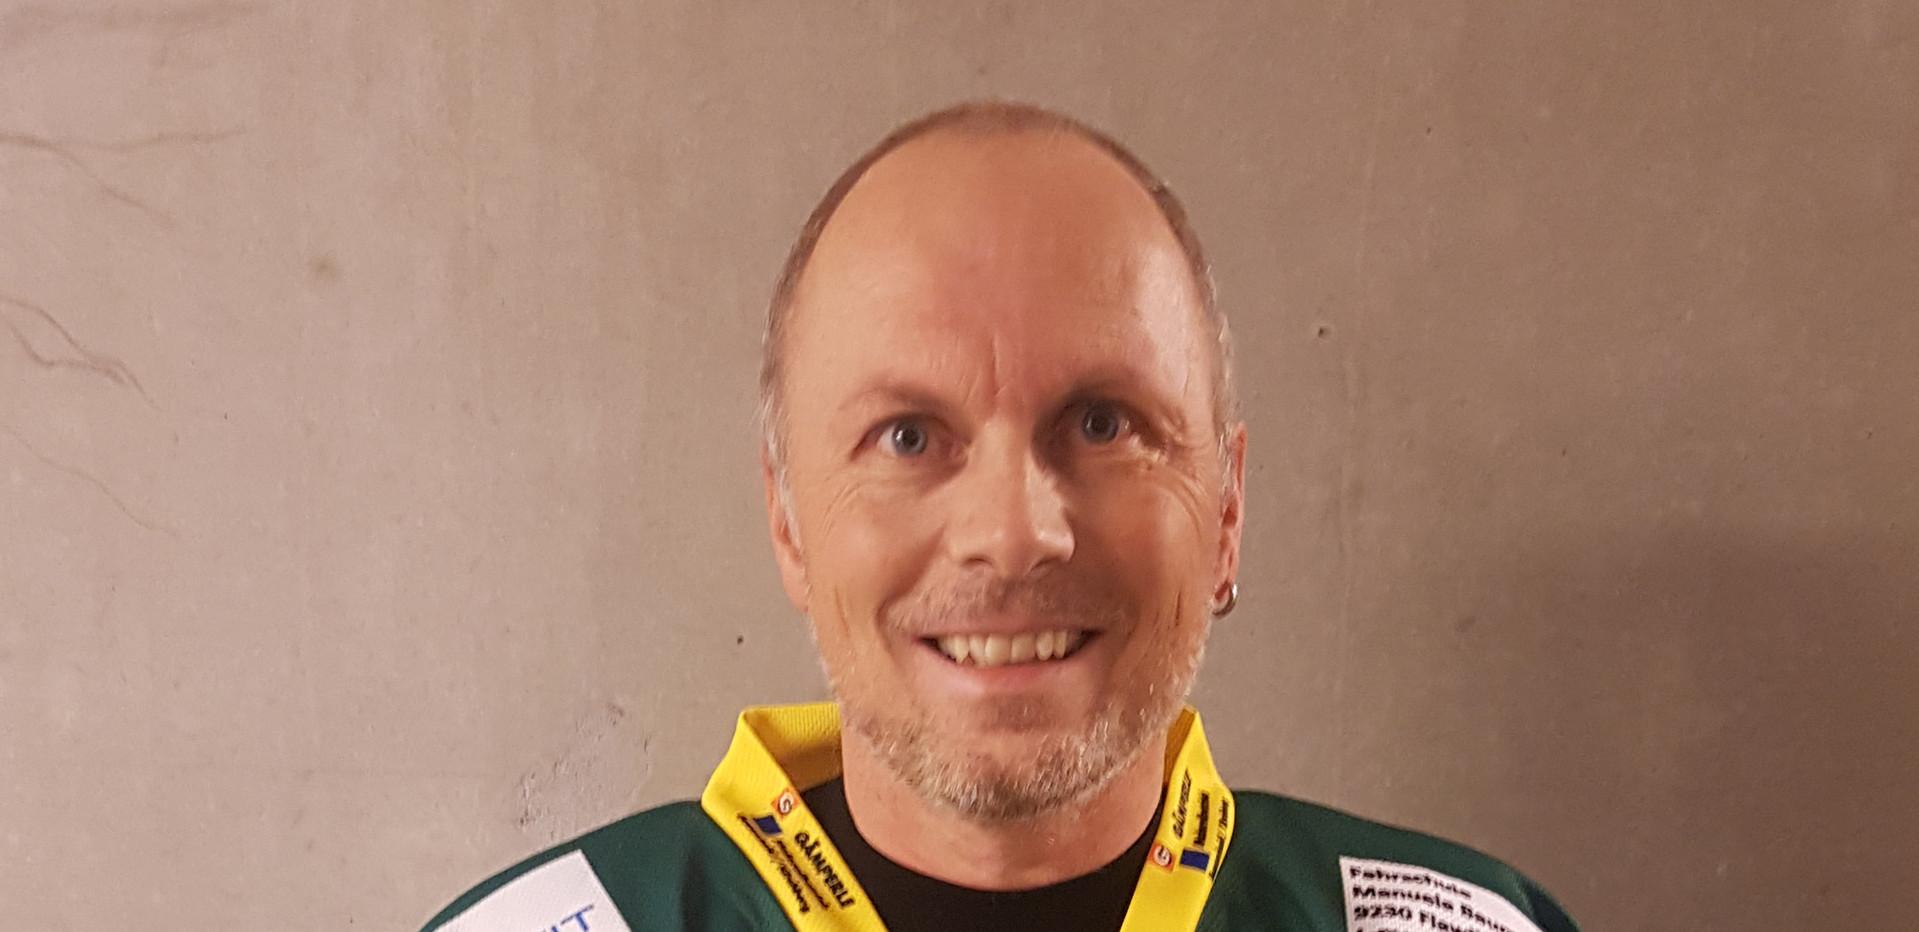 Thomas Schaier #68